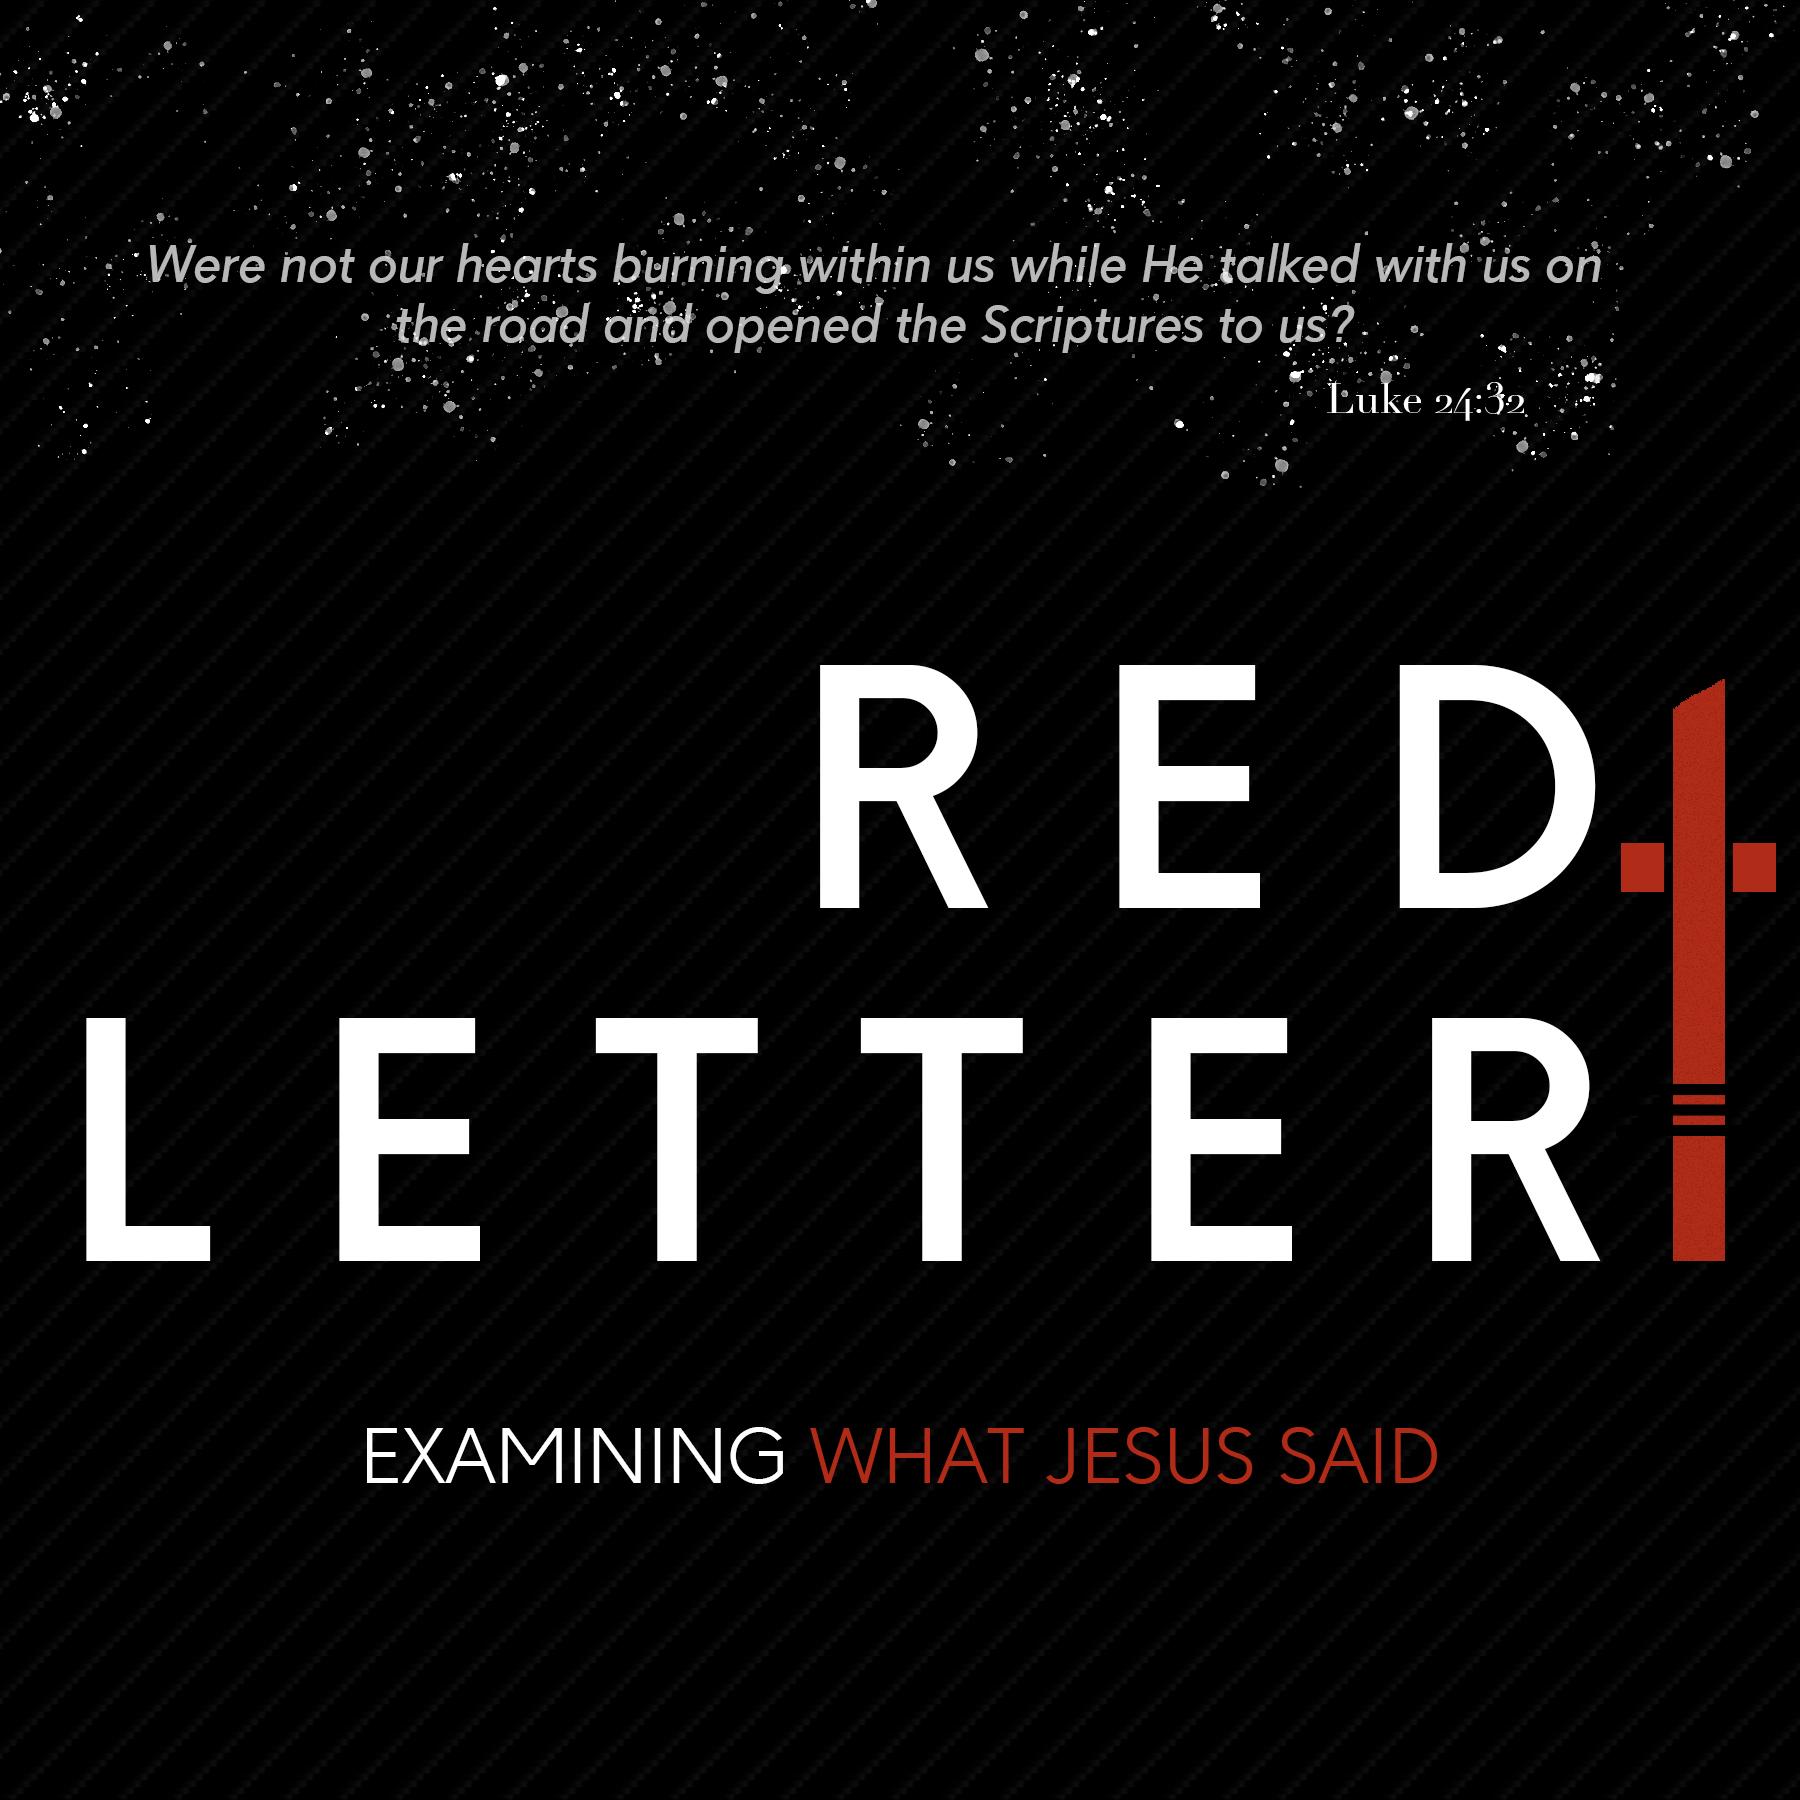 red letter instagram no type.jpg